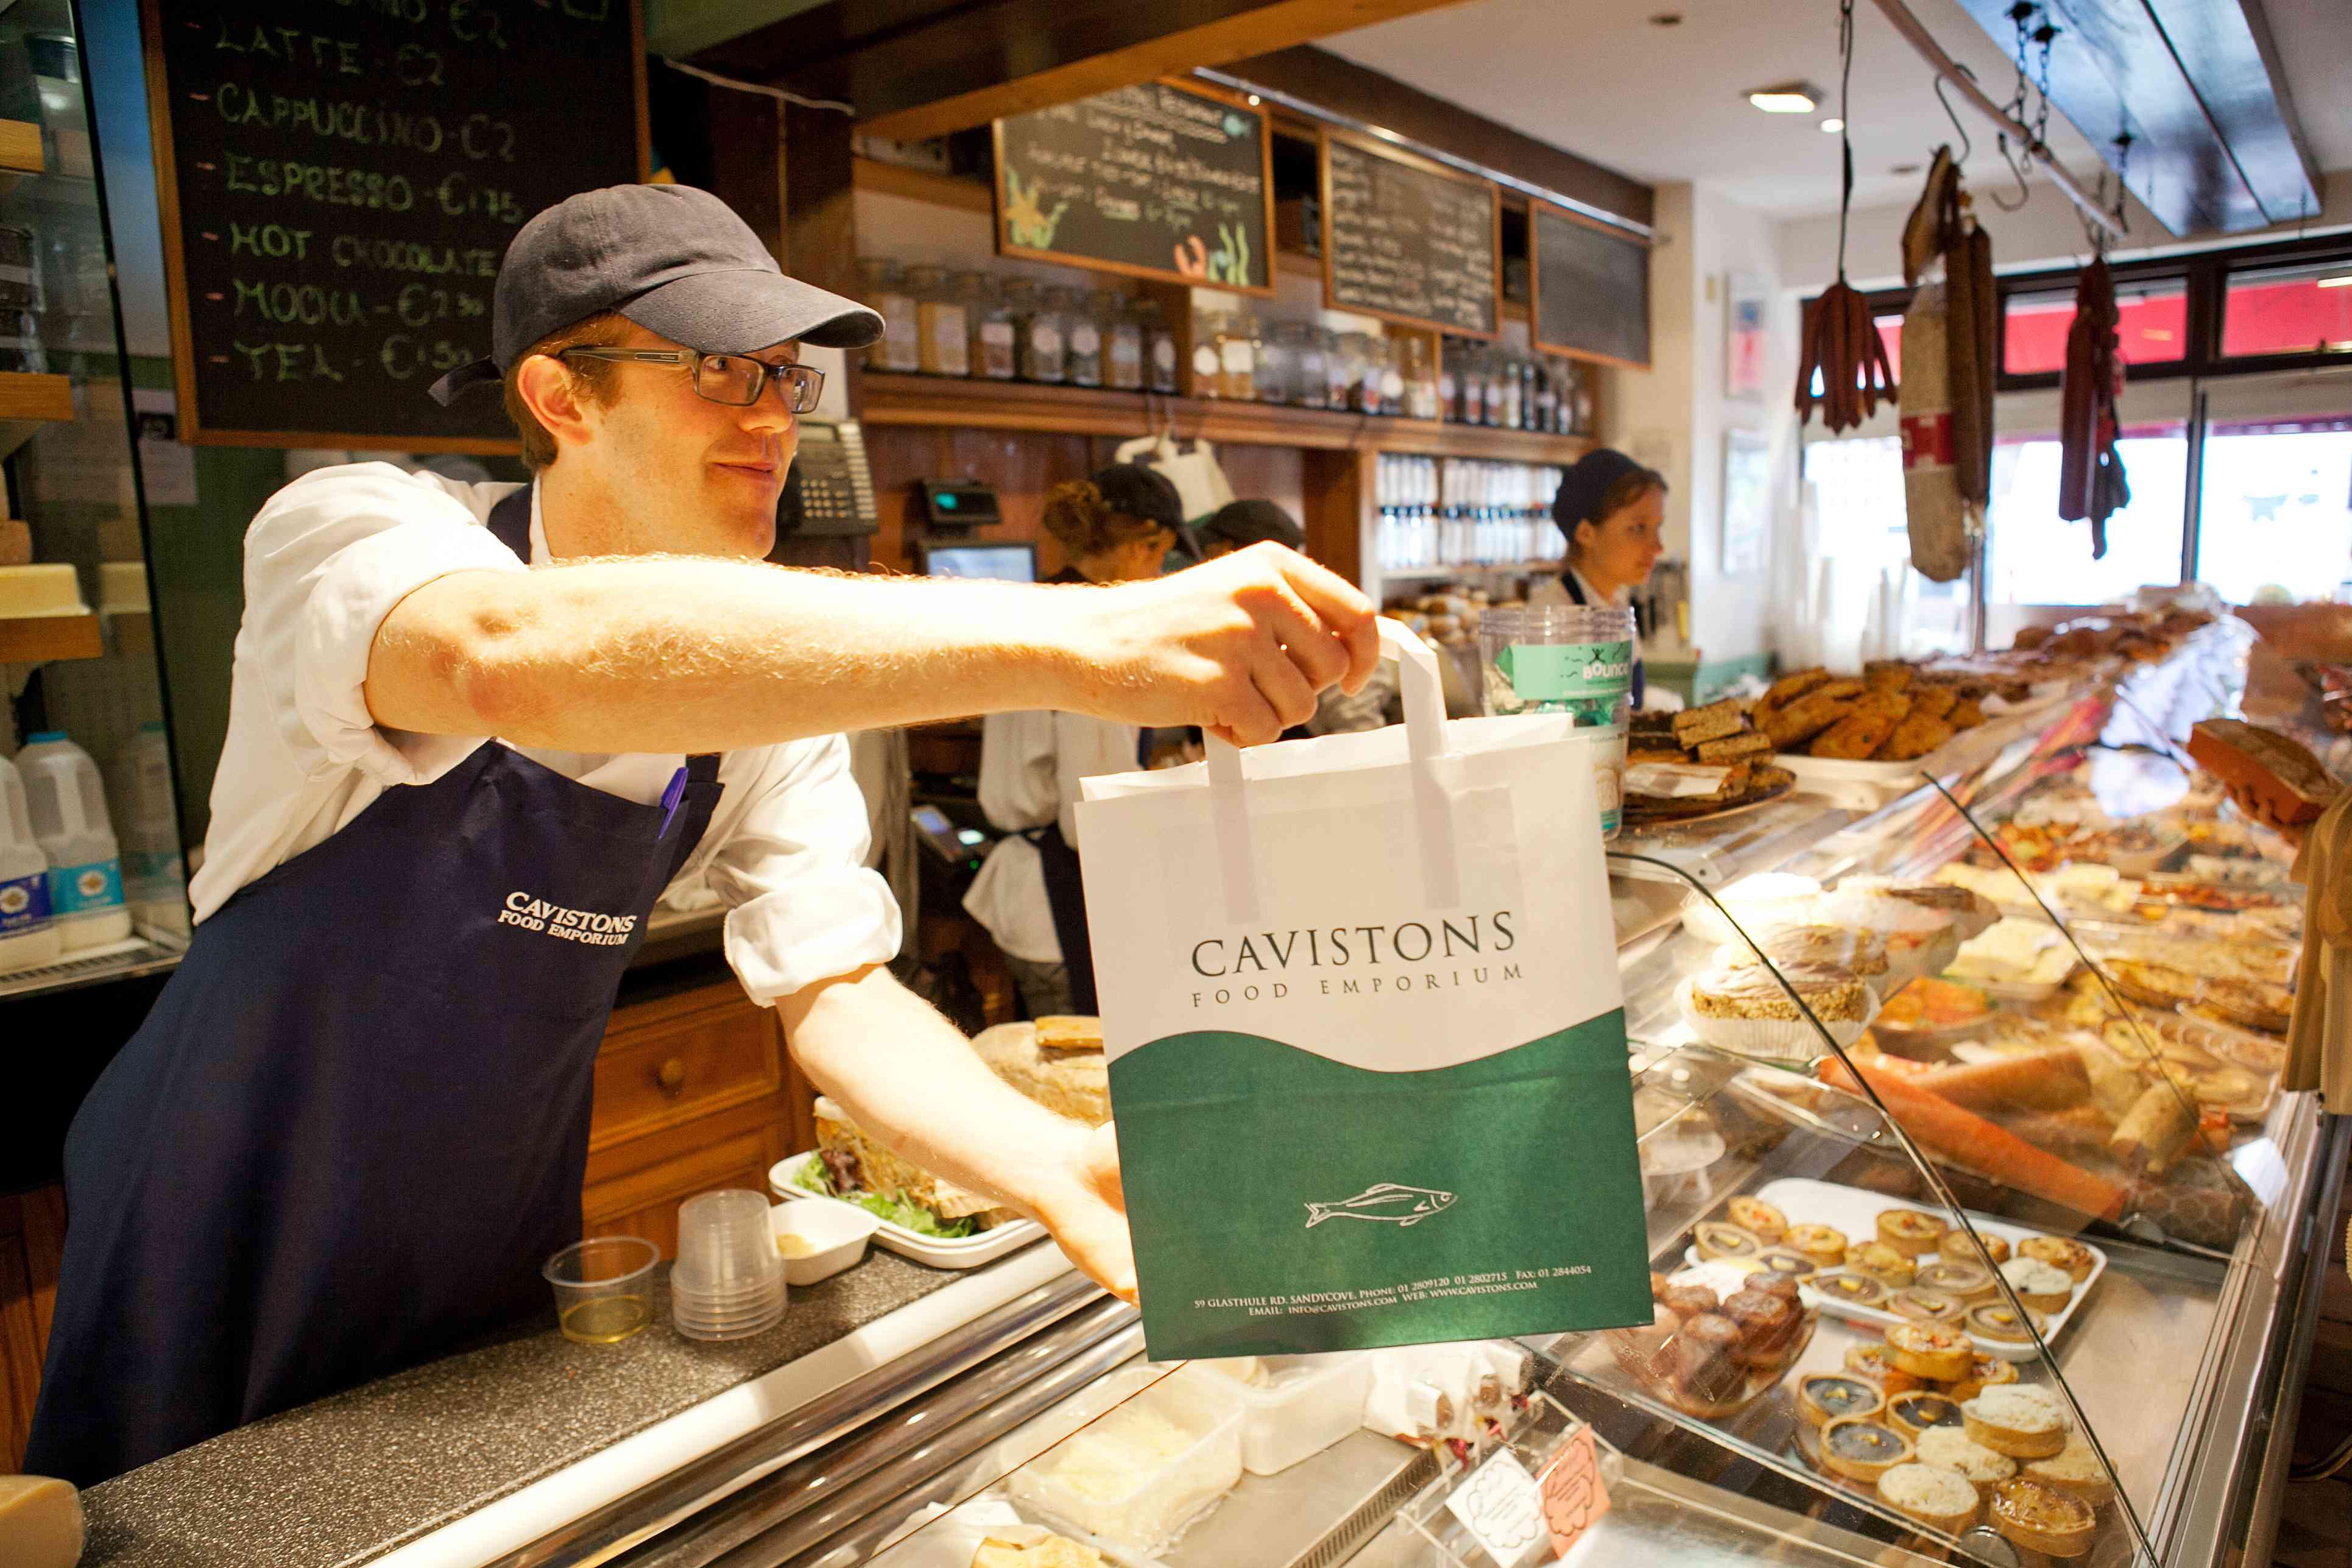 Cavistons Food Emporium | Cavistons Dark Muscovado Sugar 500g